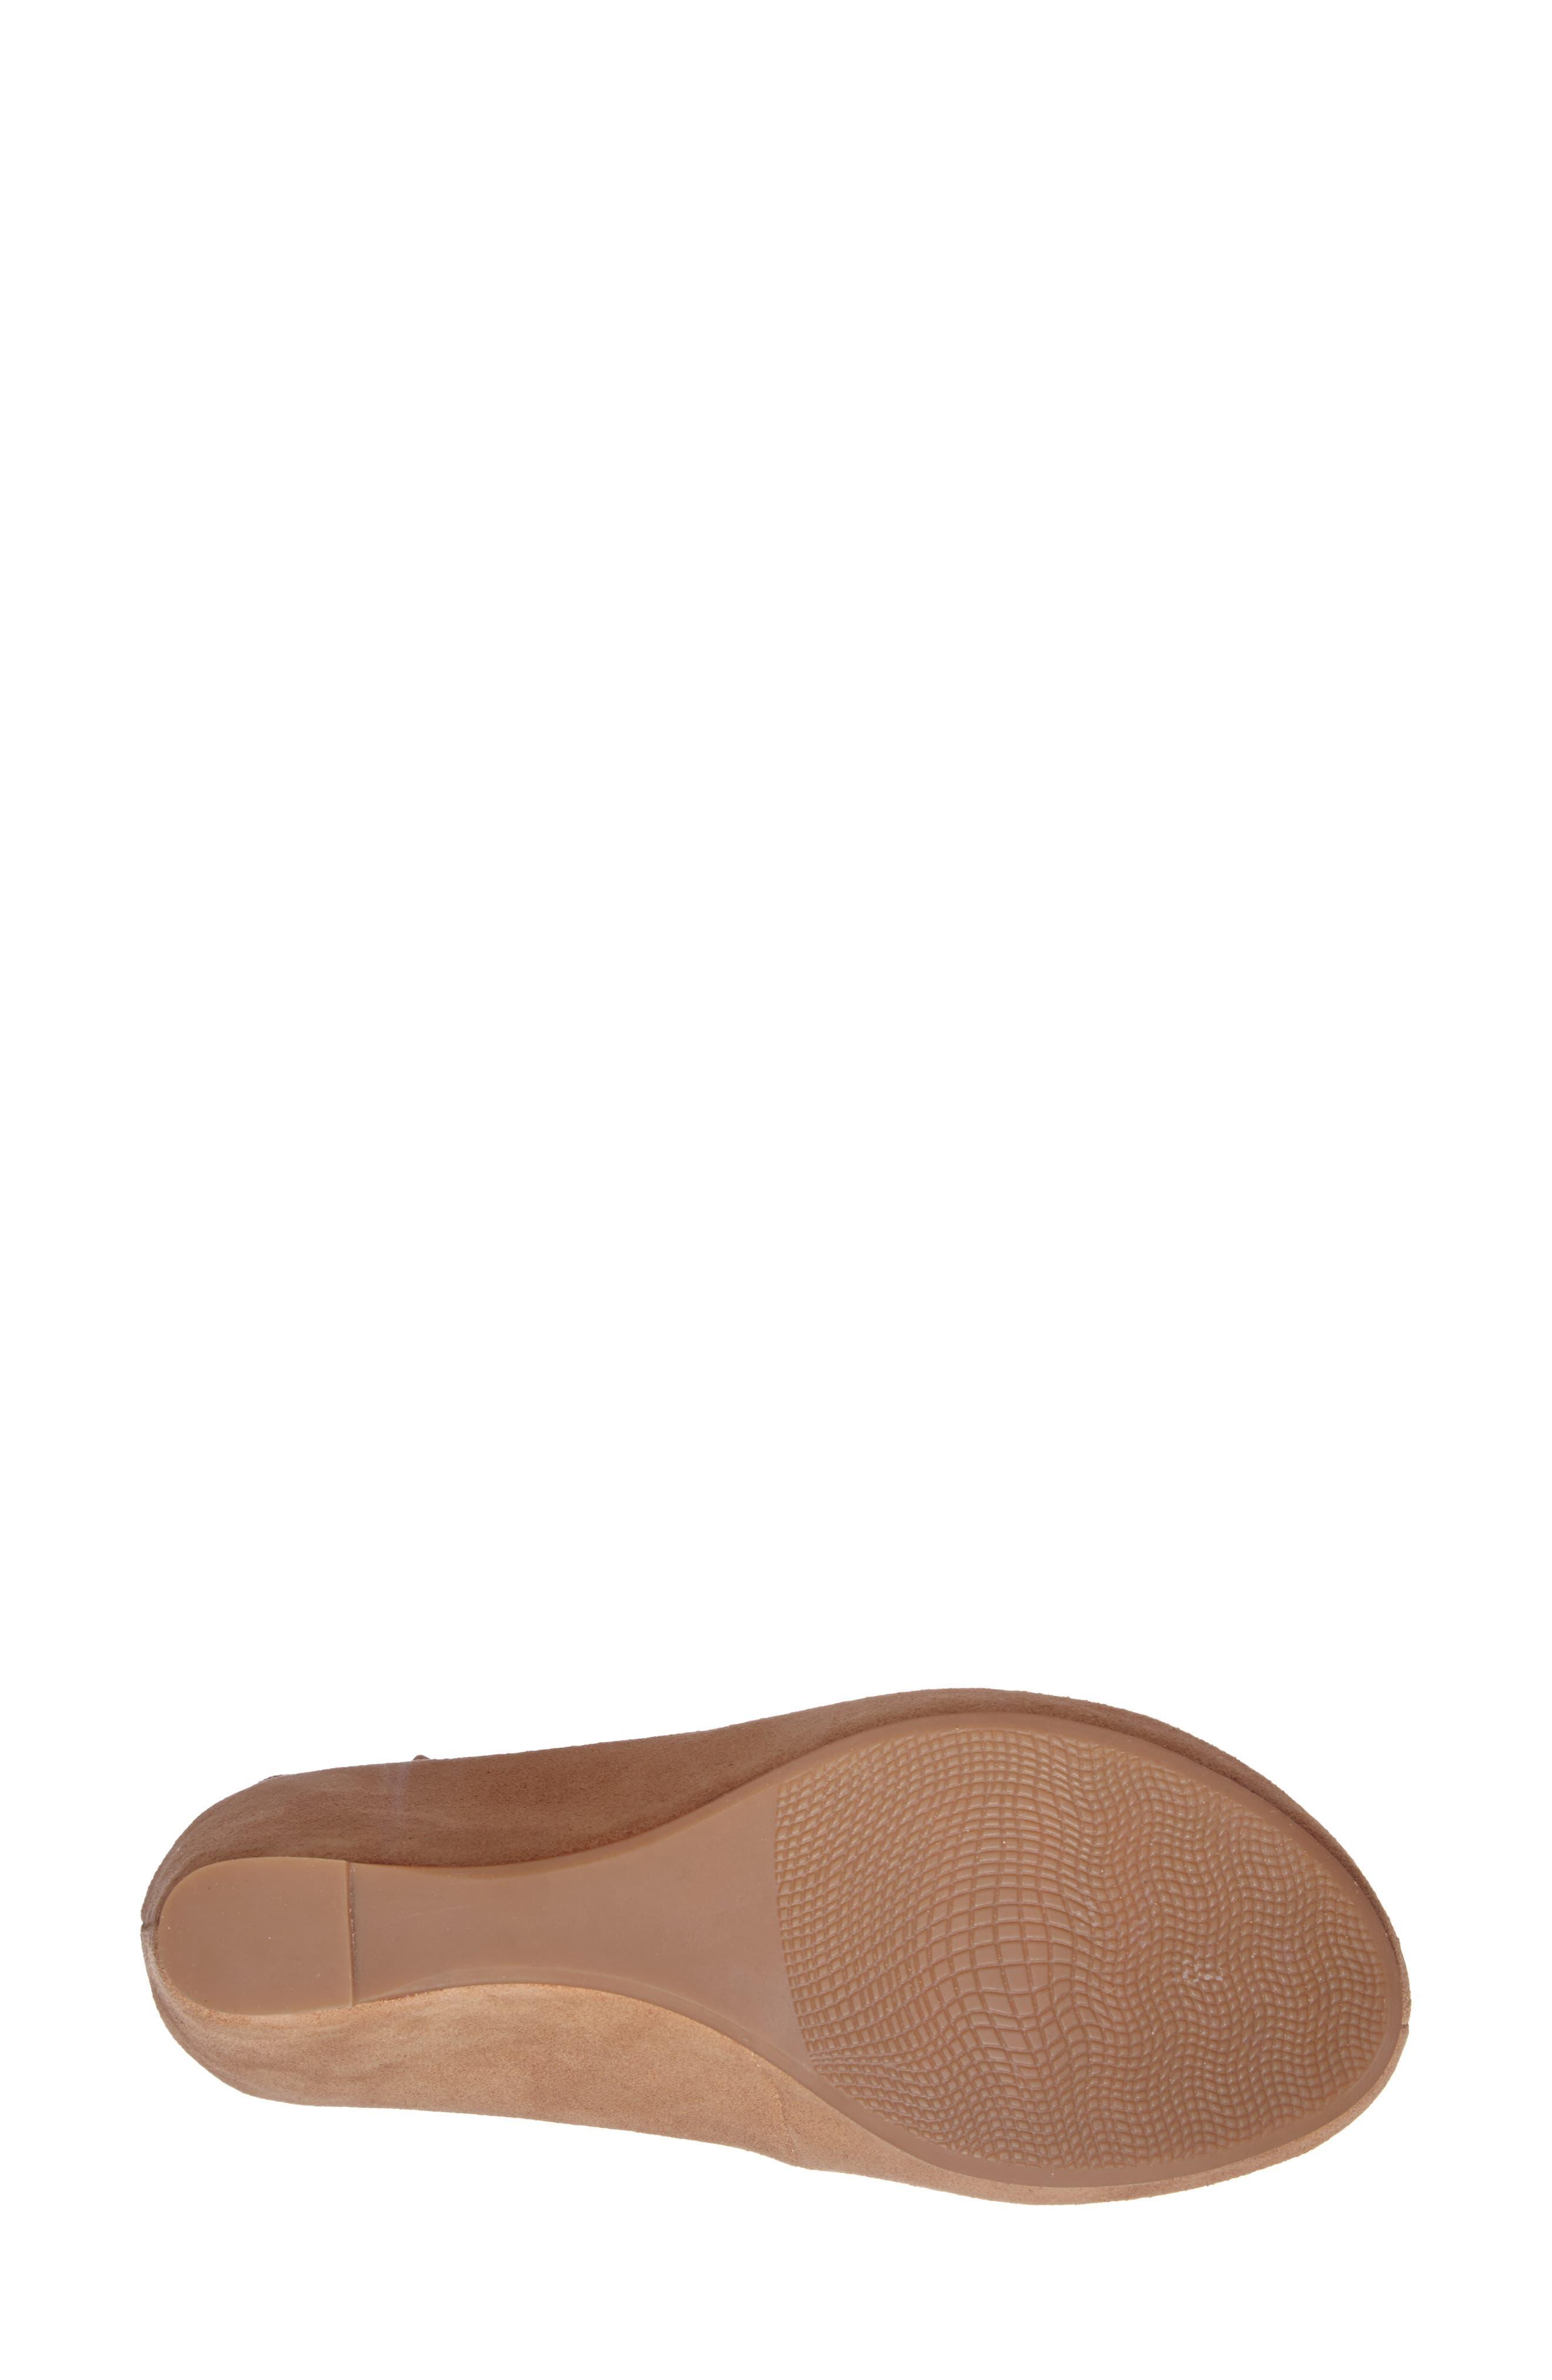 'Tricia' Ankle Strap Sandal,                             Alternate thumbnail 14, color,